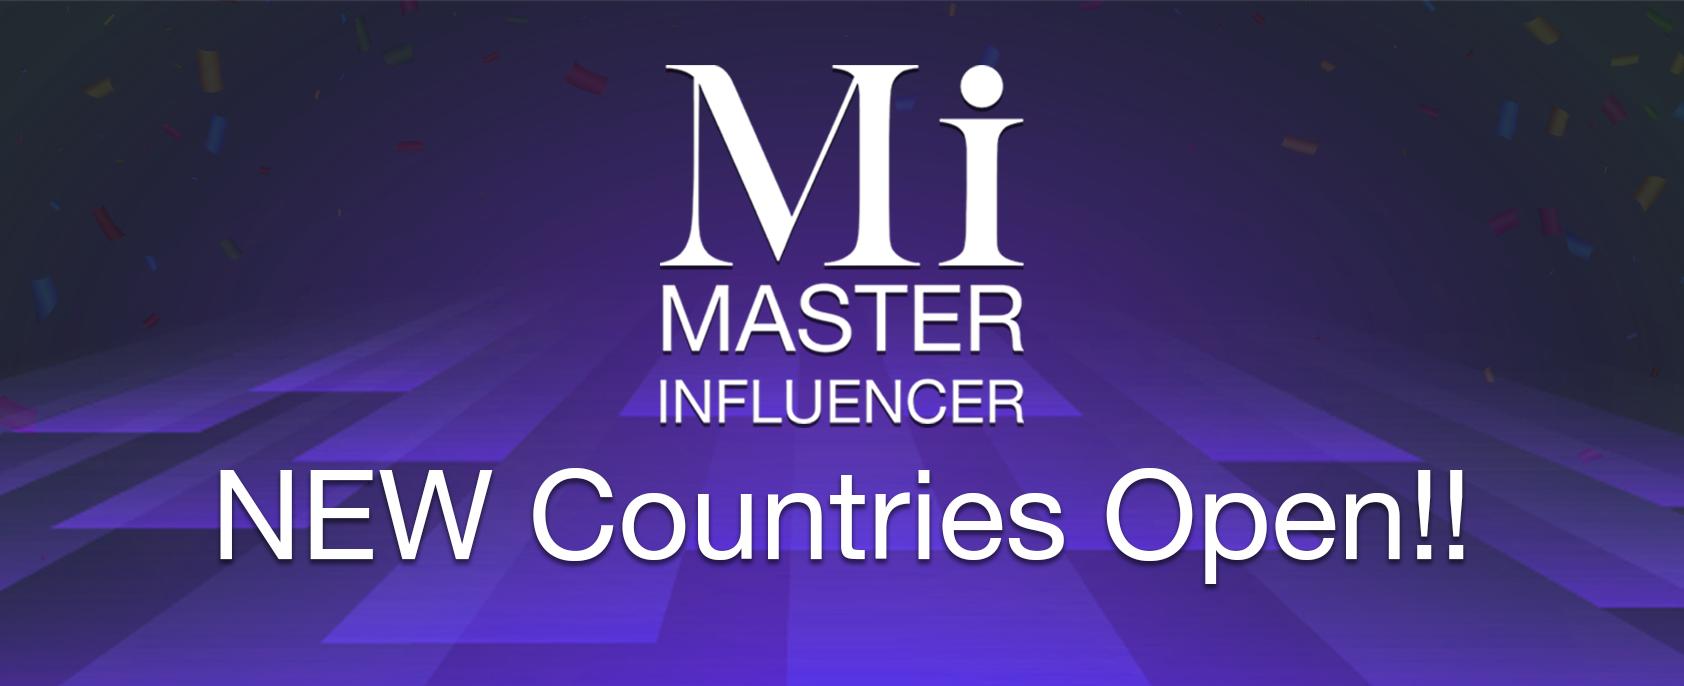 Mi New Countries Open